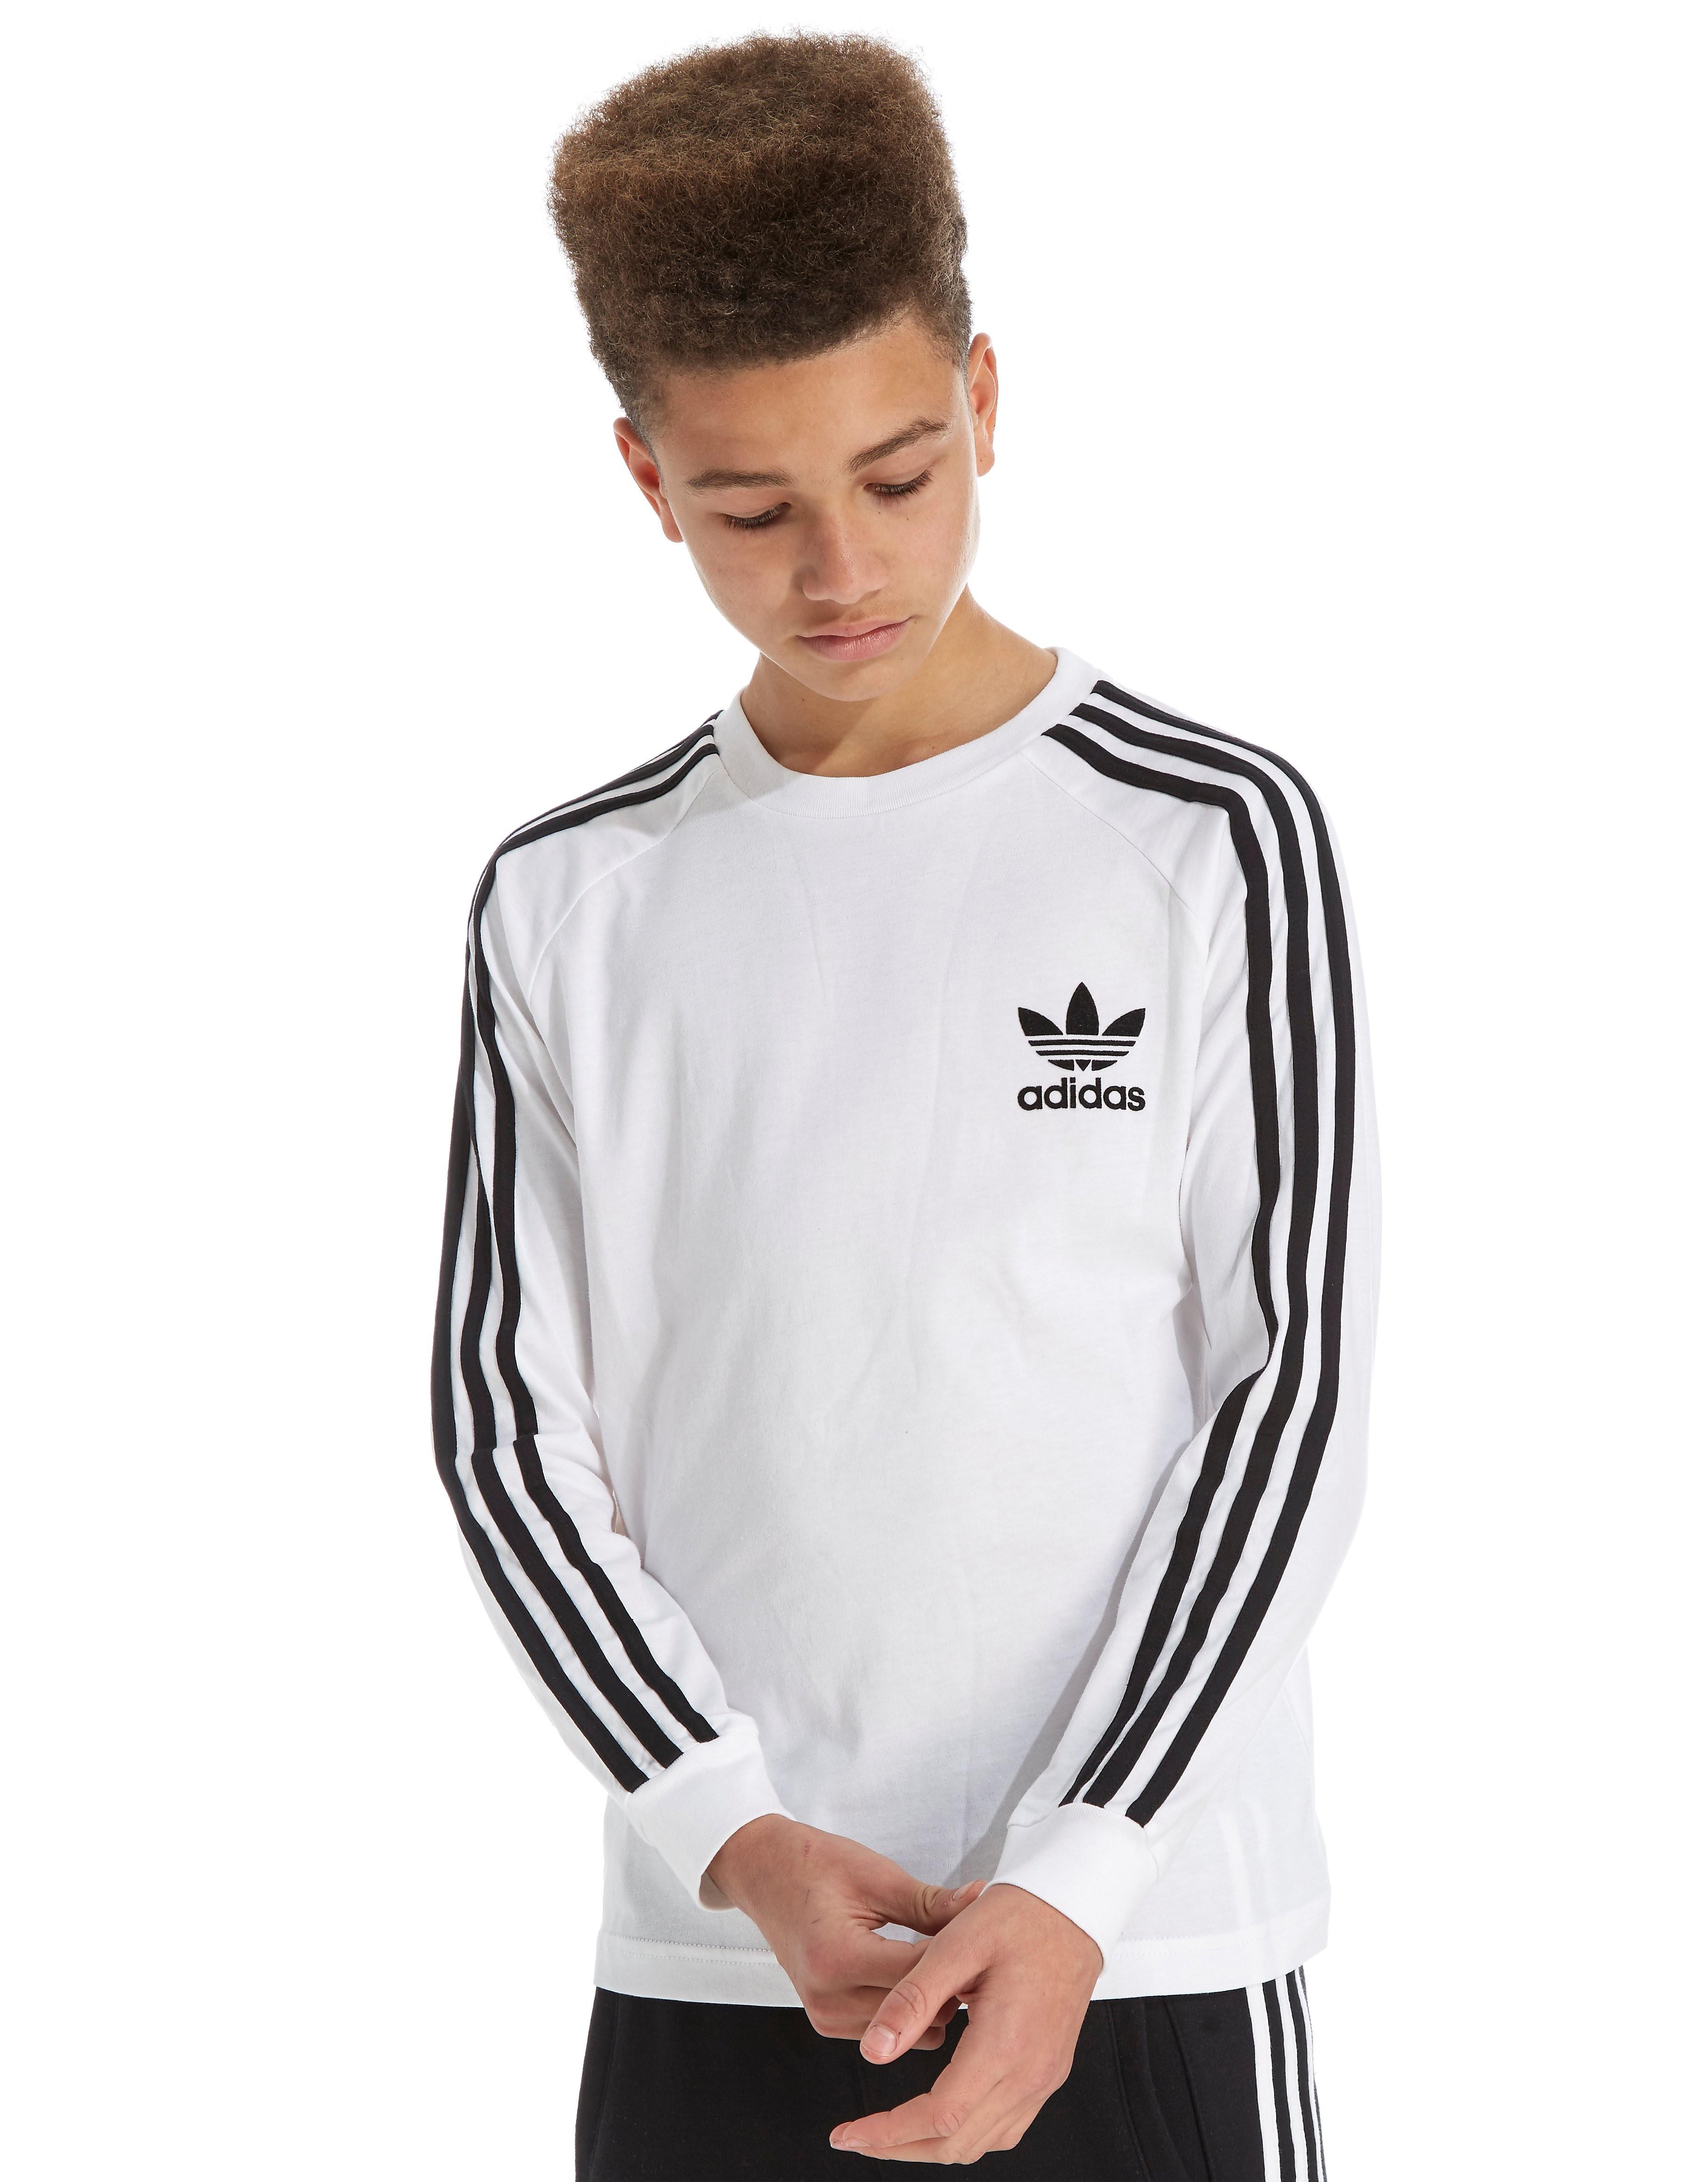 adidas Originals Long Sleeve California T-Shirt Junior